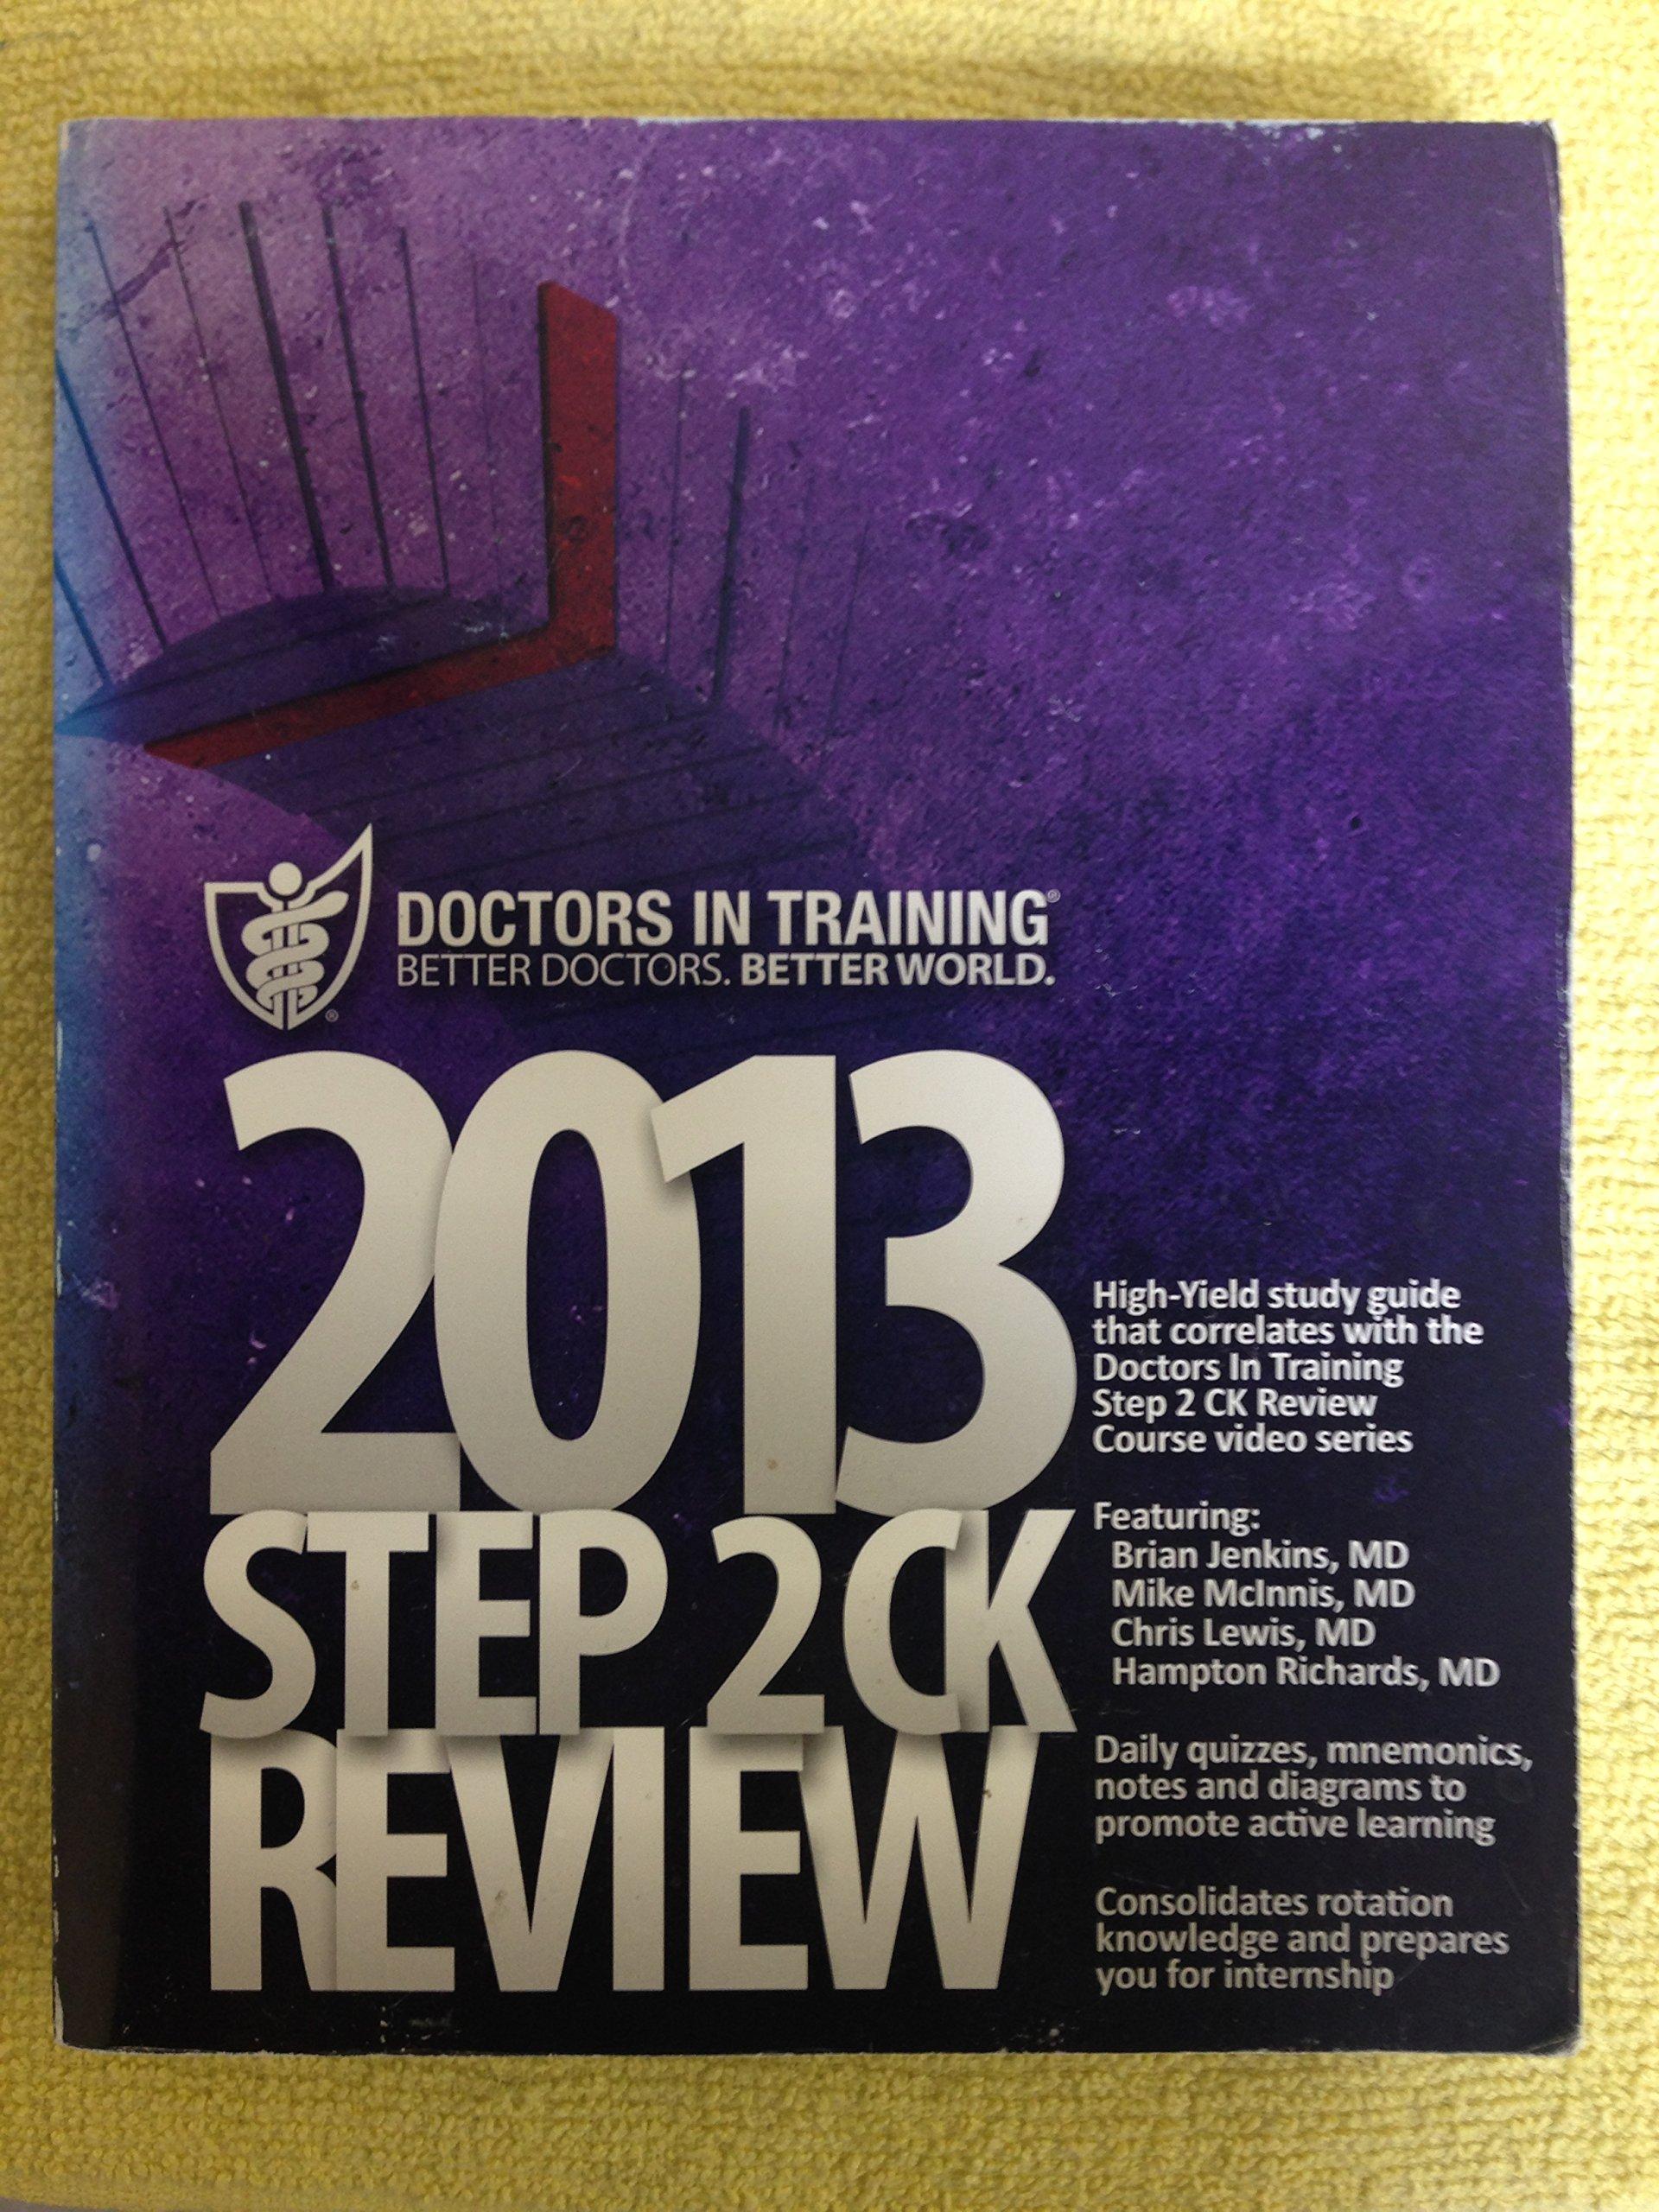 USMLE Step 2 CK Review Study Guide - 2013 Edition: Brian